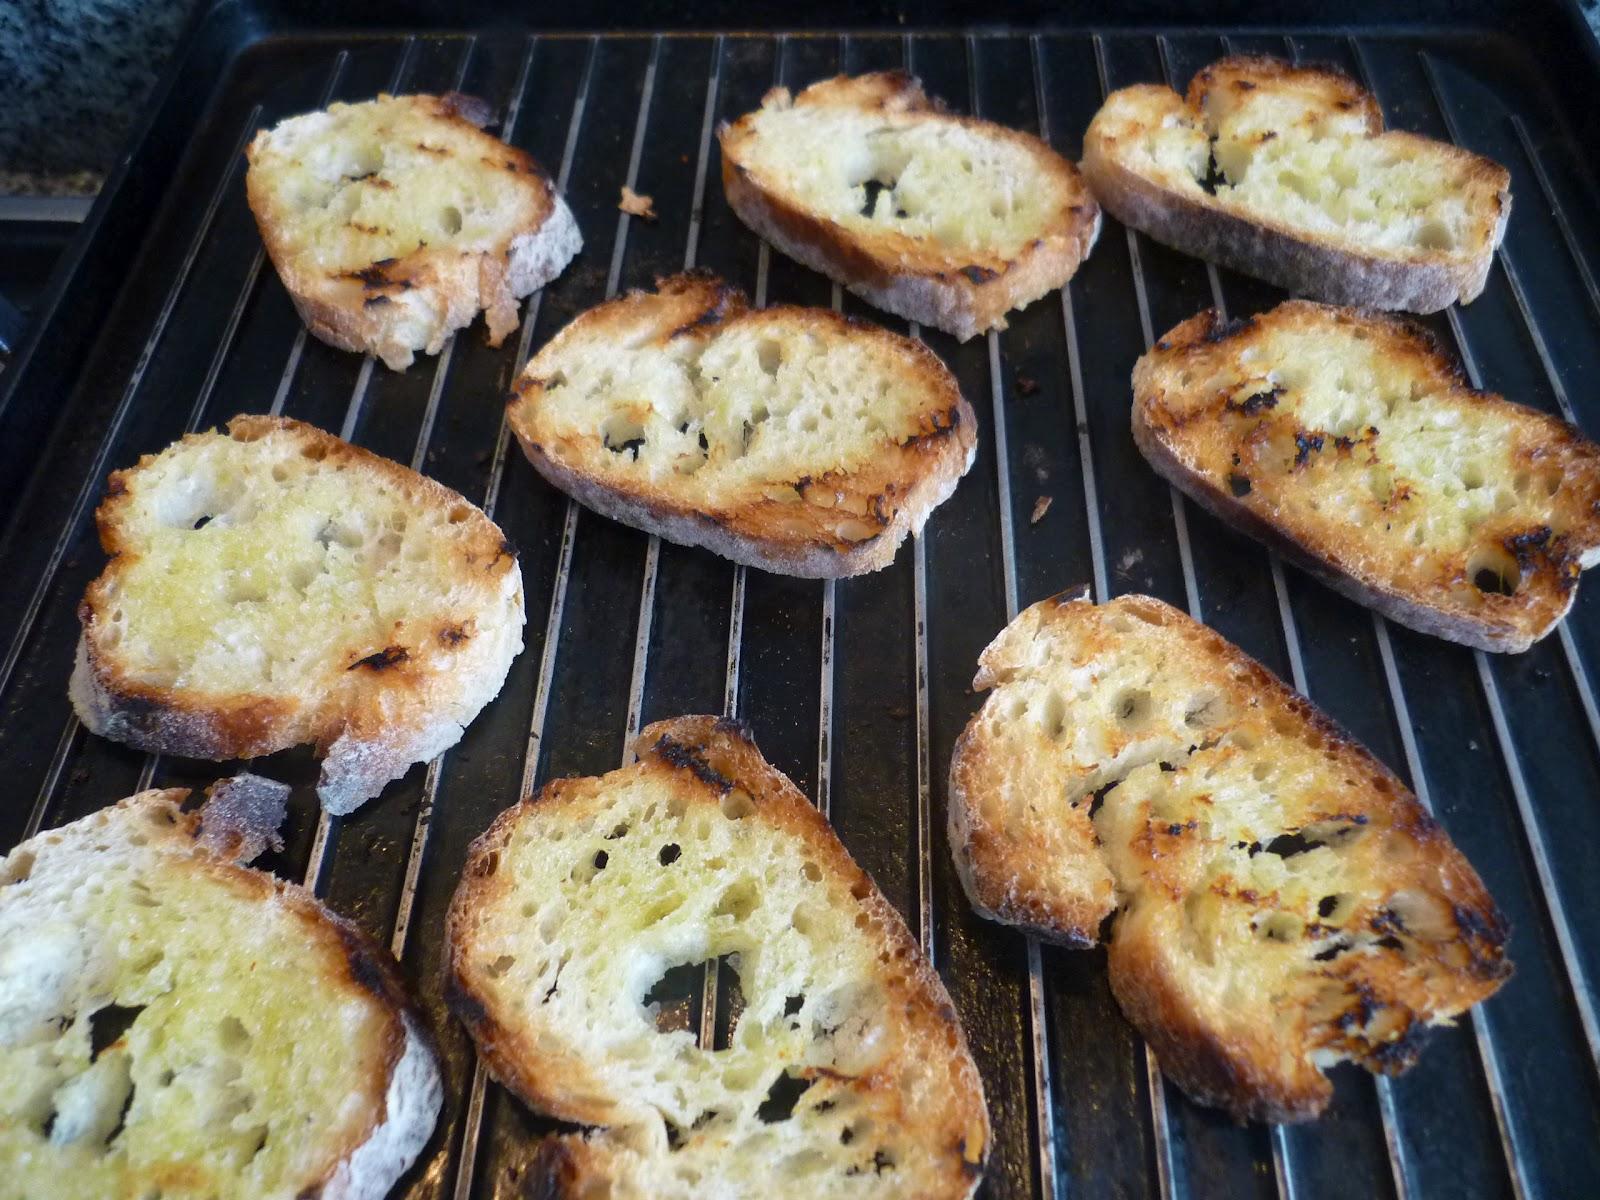 Crostini + Tomates con Albahaca - 03